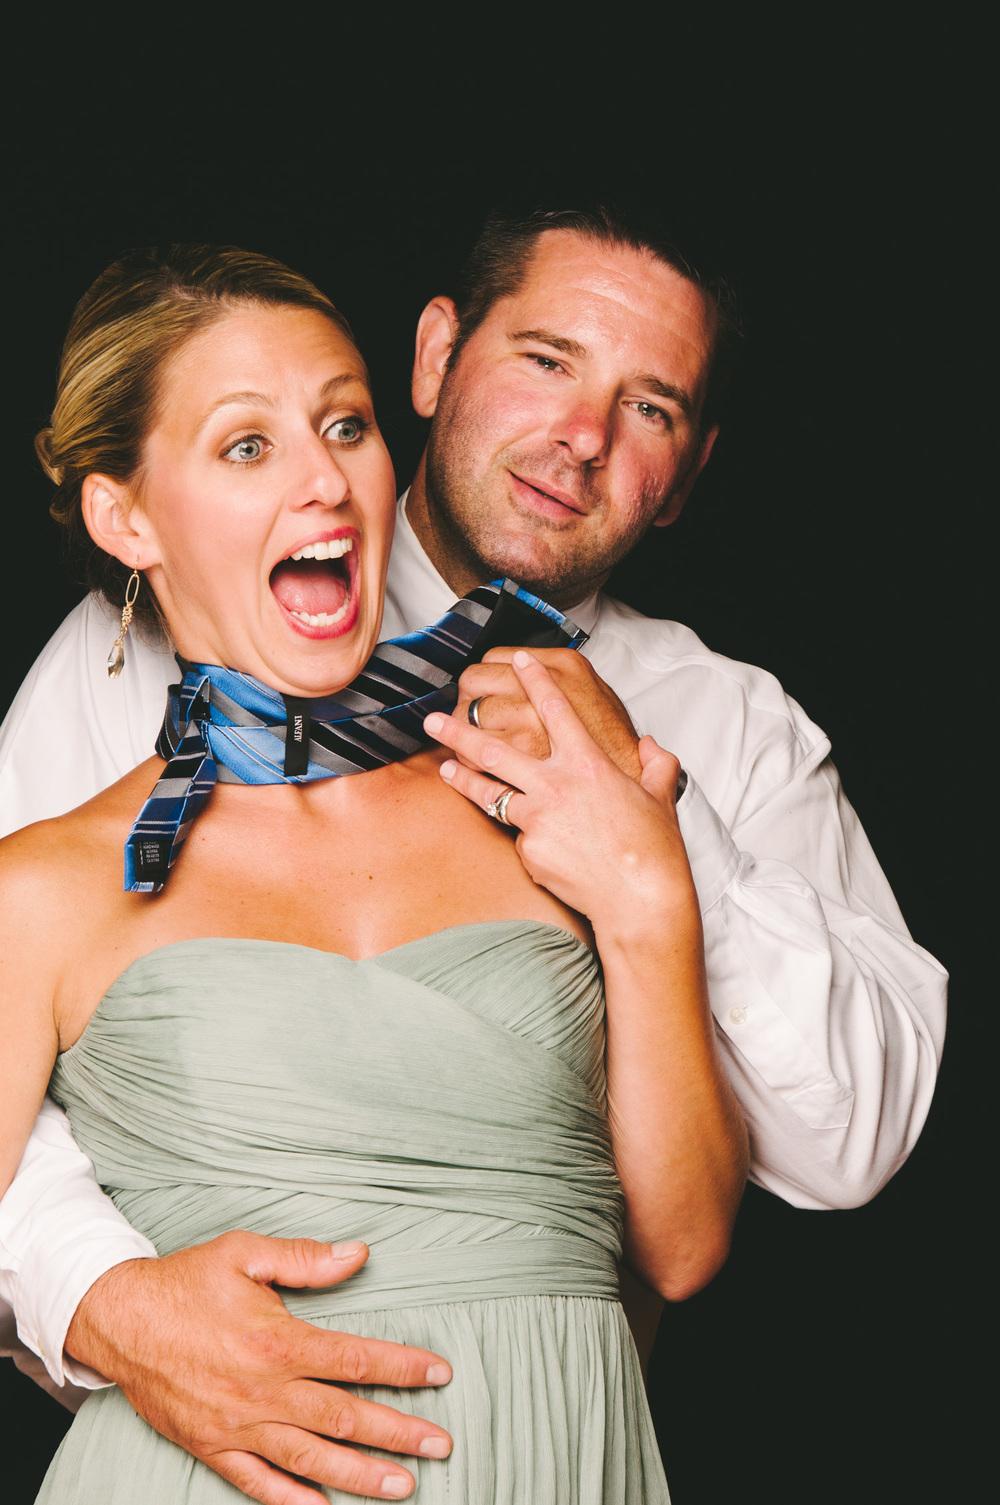 front-and-palmer-philadelphia-wedding-36.jpg